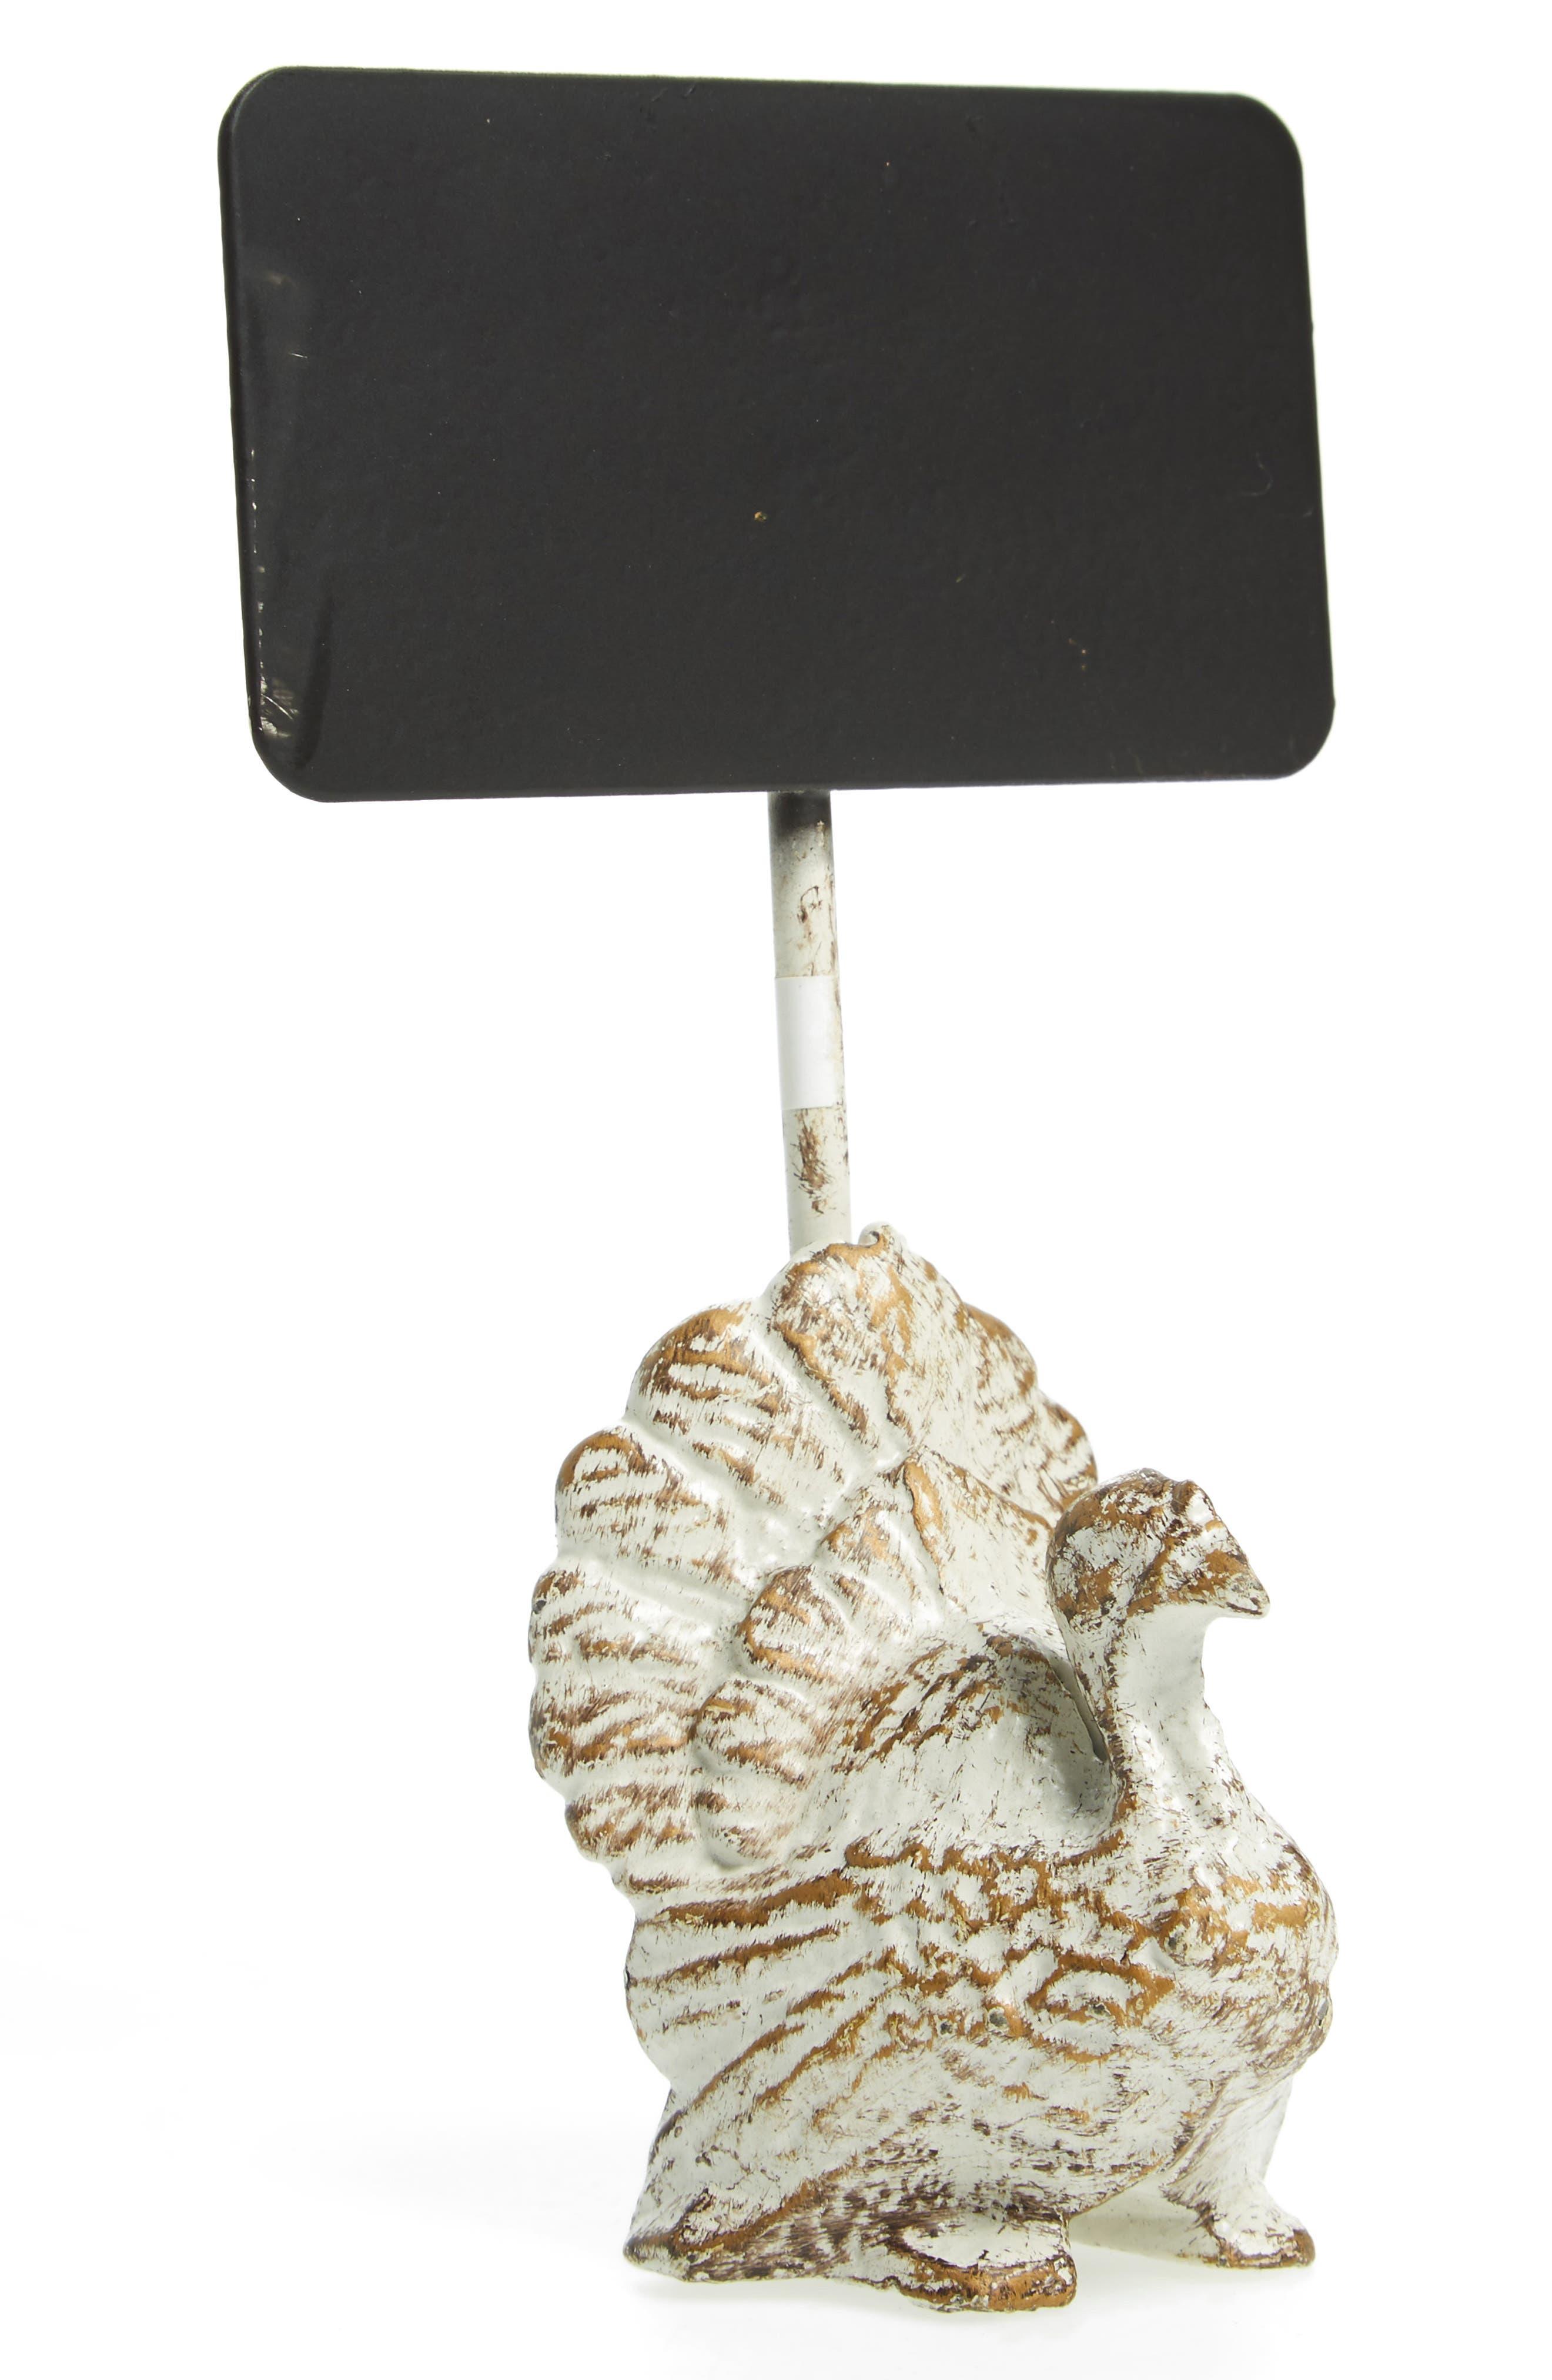 Turkey Chalkboard Namecard,                         Main,                         color, Beige/ Black